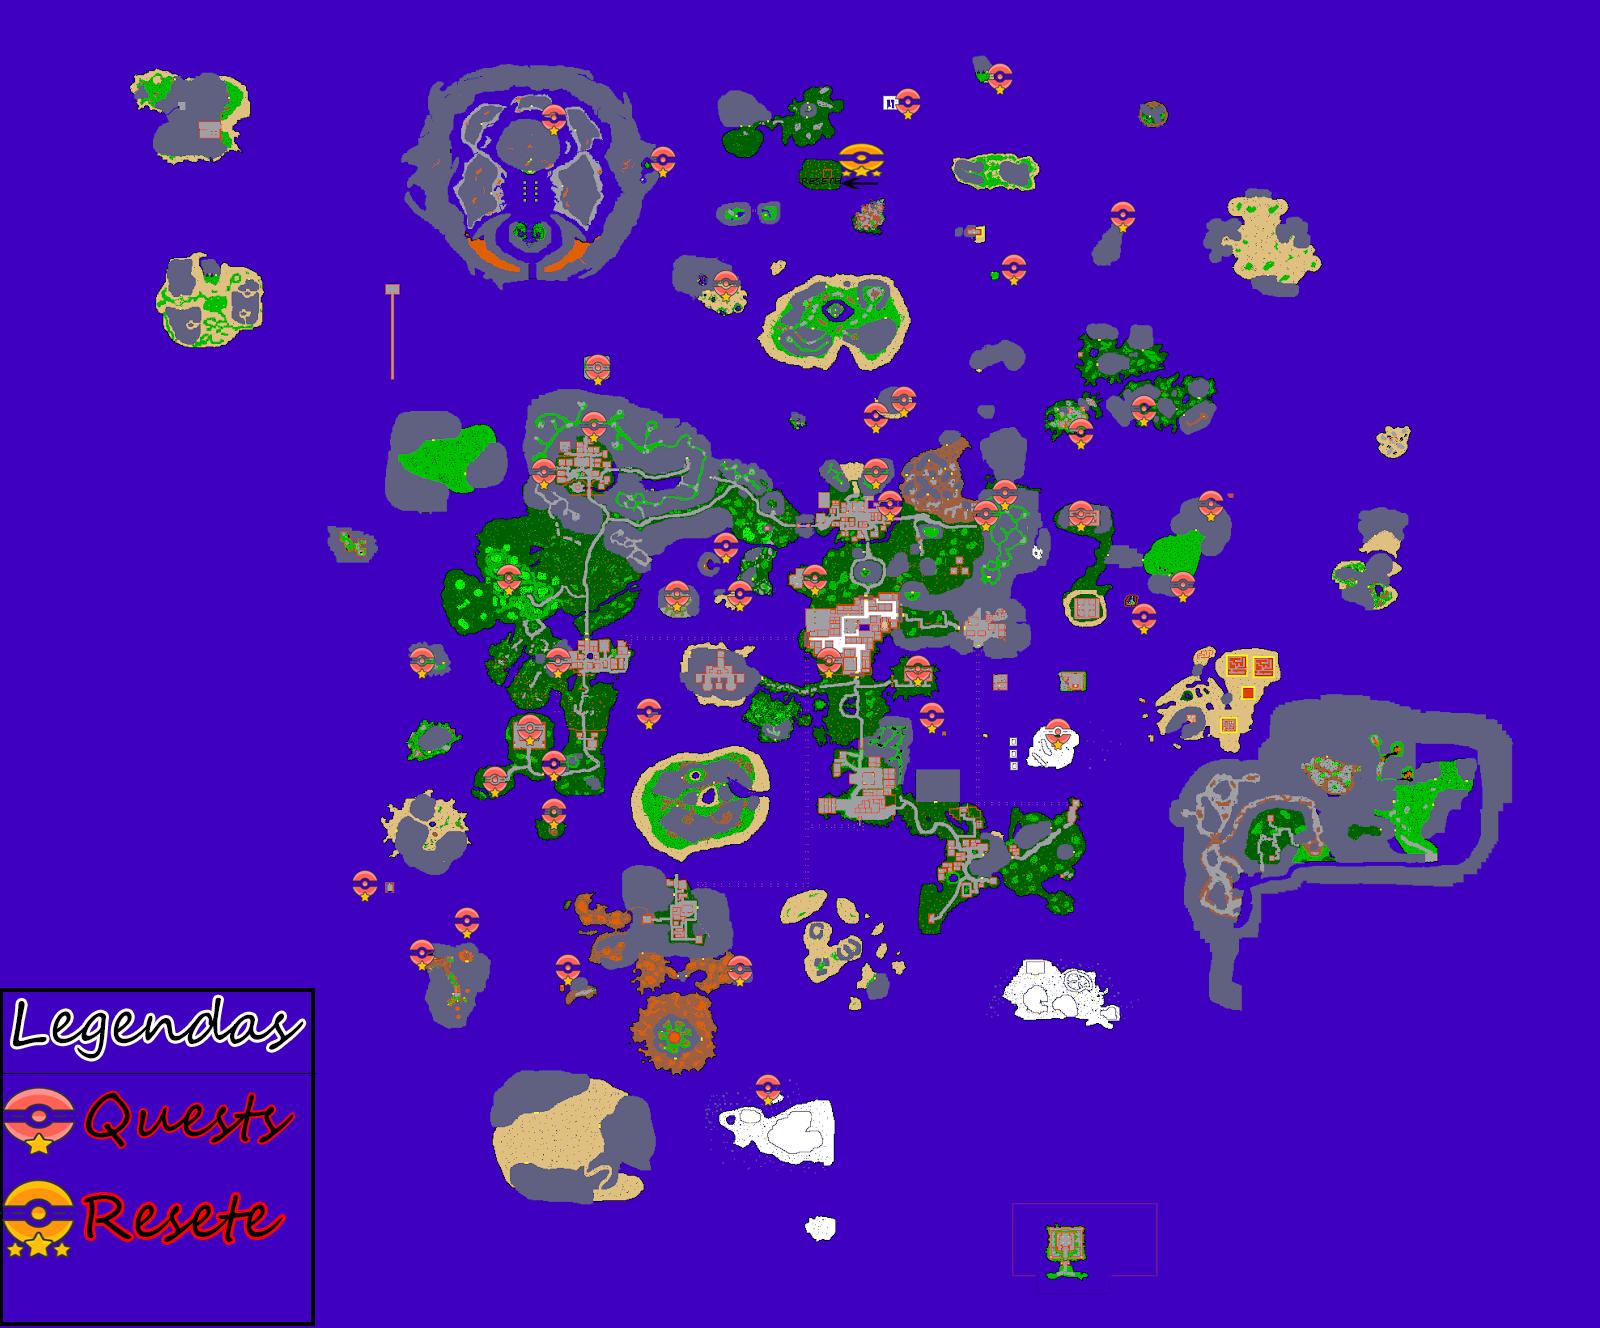 https://1.bp.blogspot.com/-jIC7jyti50Q/Xe2E8-cIAtI/AAAAAAAAAjk/S6EPgVm99BoNhHvD9vvsVPynDPXOqE5jwCLcBGAsYHQ/s1600/Mapa%2BHand.png